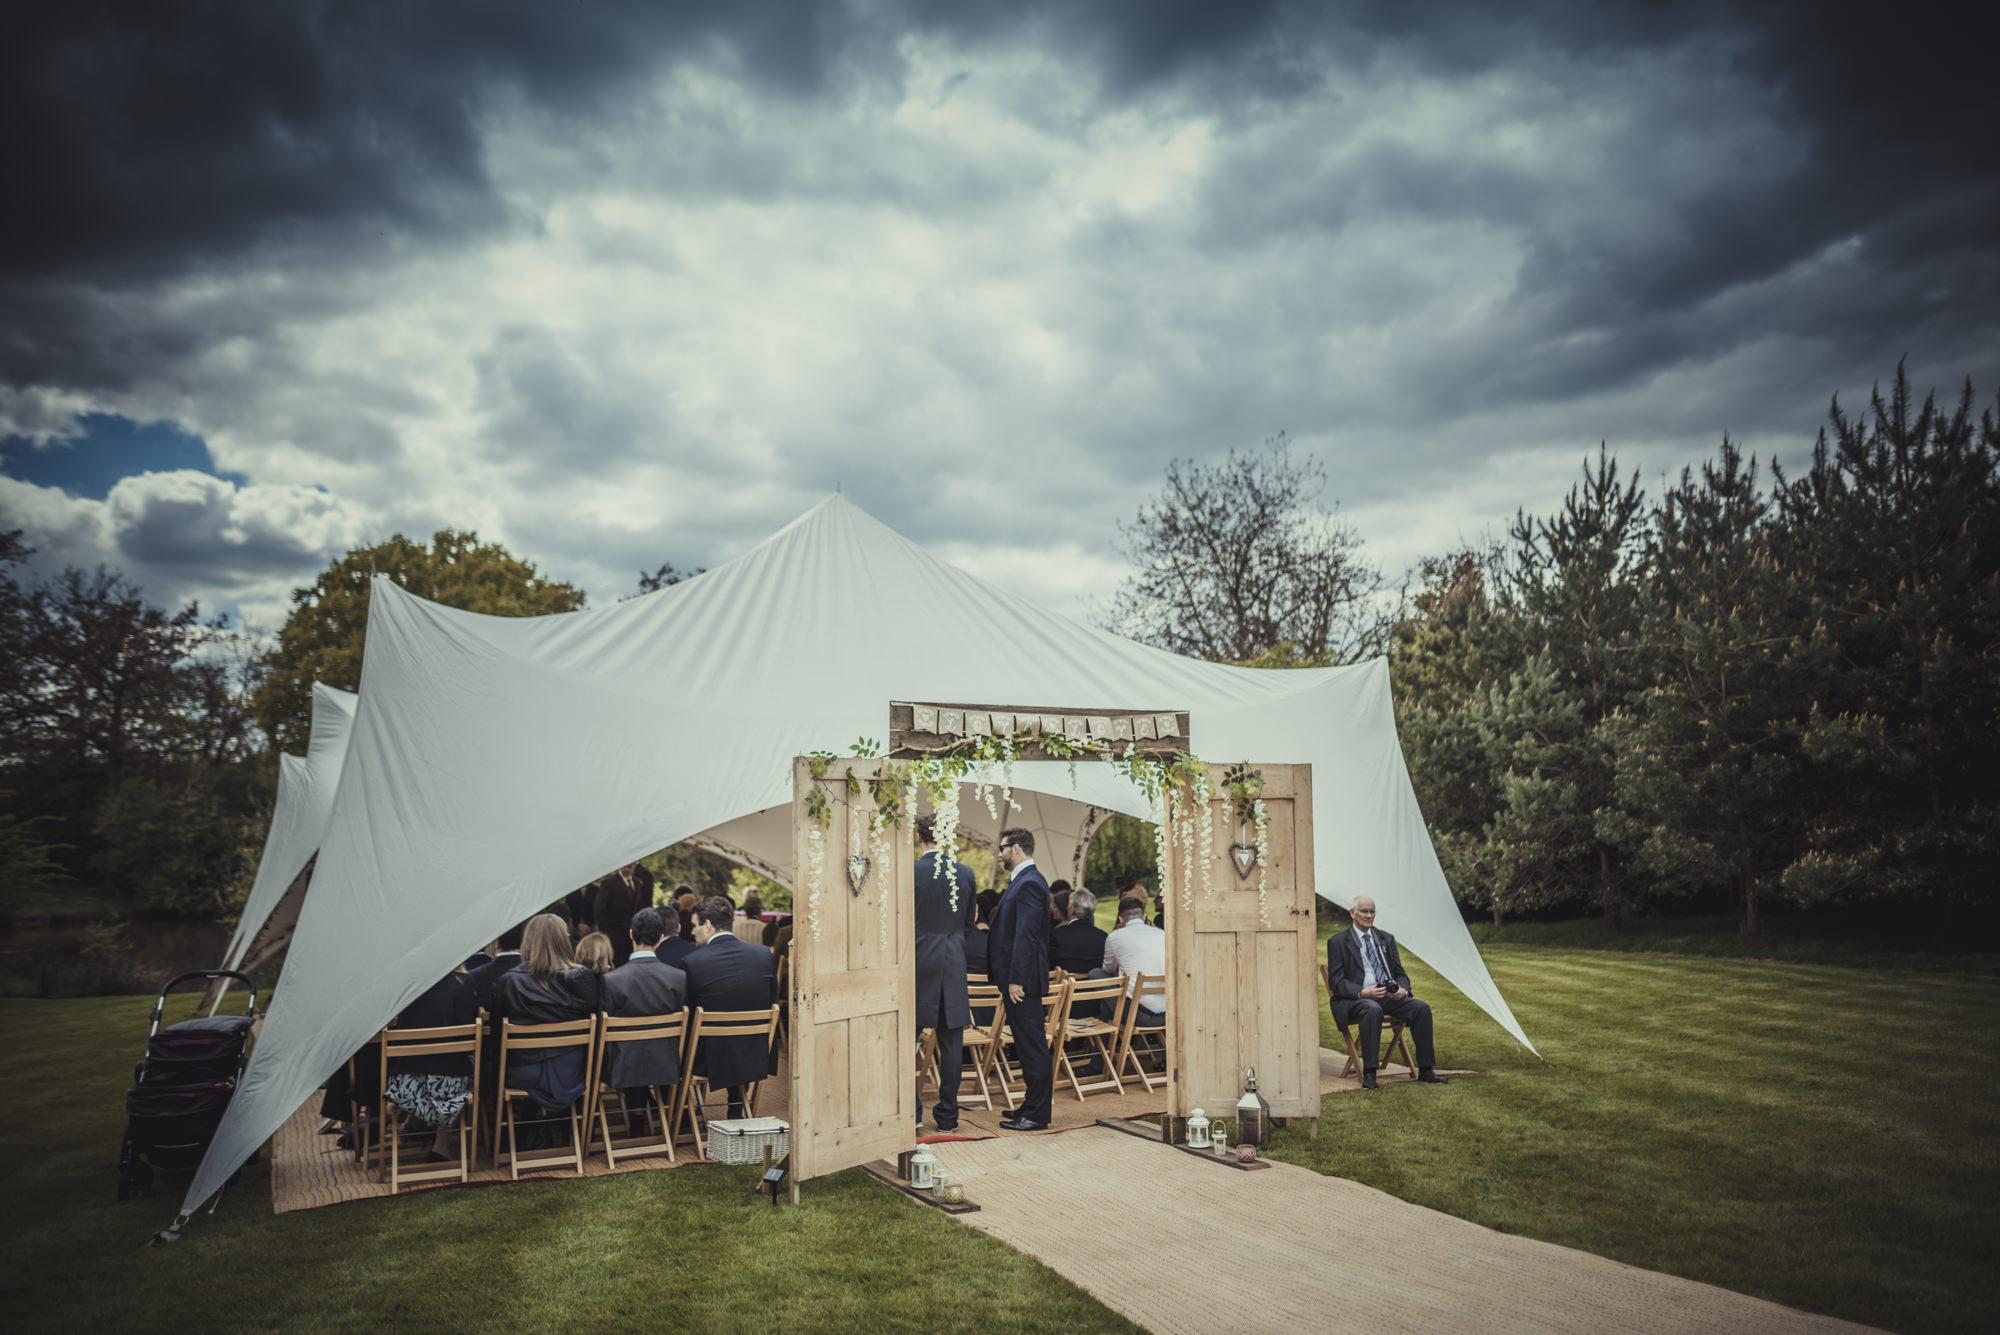 Jacqueline-Gareth-Wedding-Westmead-Events-Surrey-Manu-Mendoza-Wedding-Photography-142.jpg